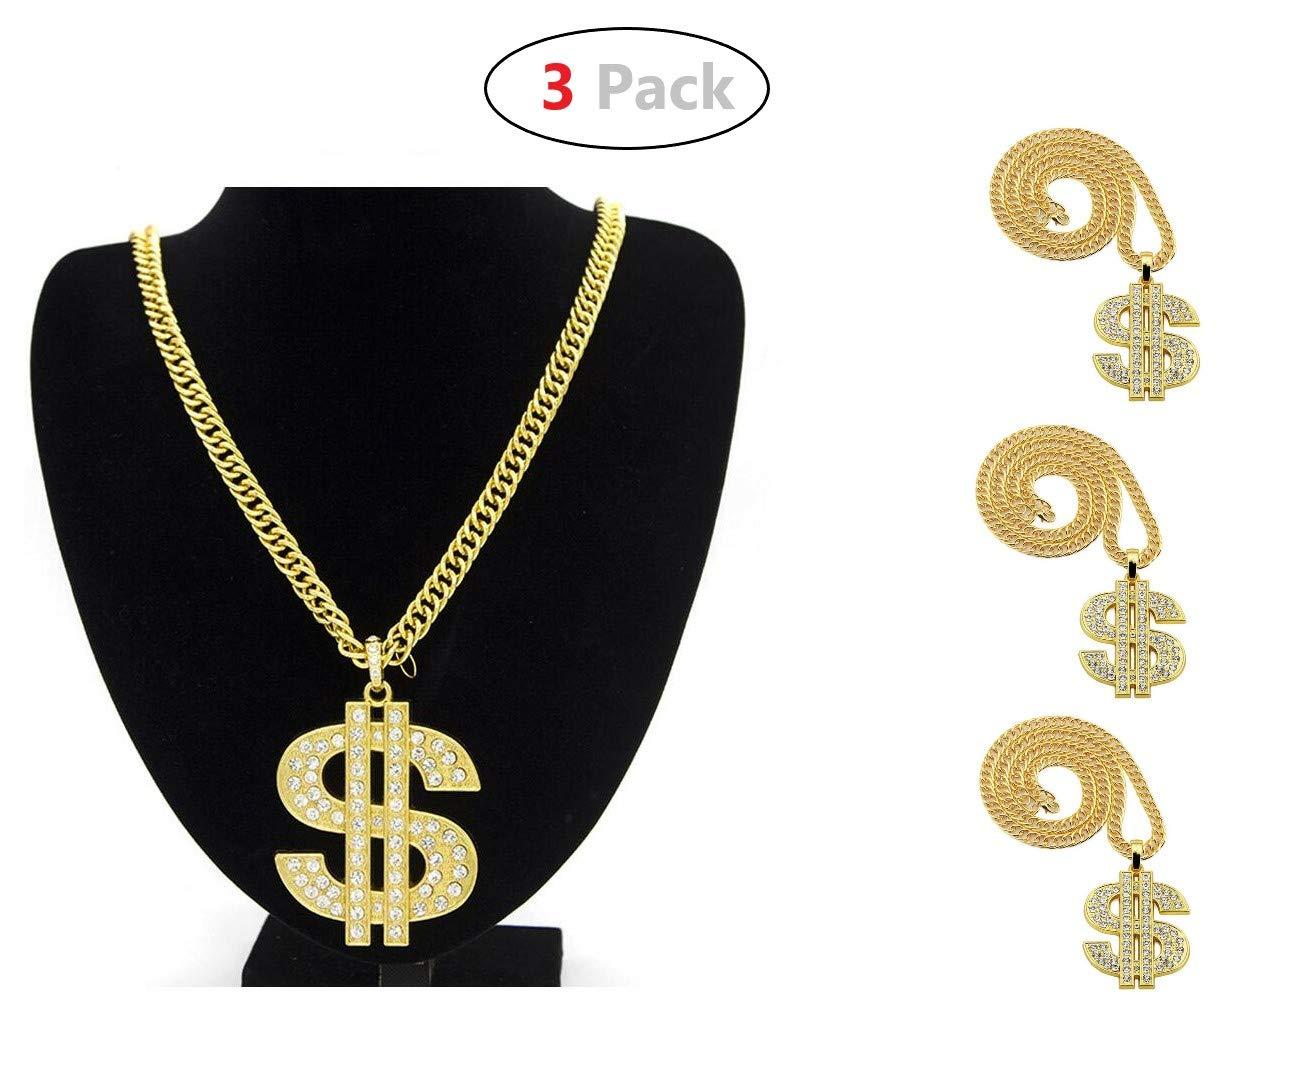 Yo-fobu 3 Pack Hip Hop Chain Necklace Rapper Gold Costume Necklace Jewelry Rapper Necklace for Club Rock Party, Long 27.5 inches, Wide 57mm by Yo-fobu